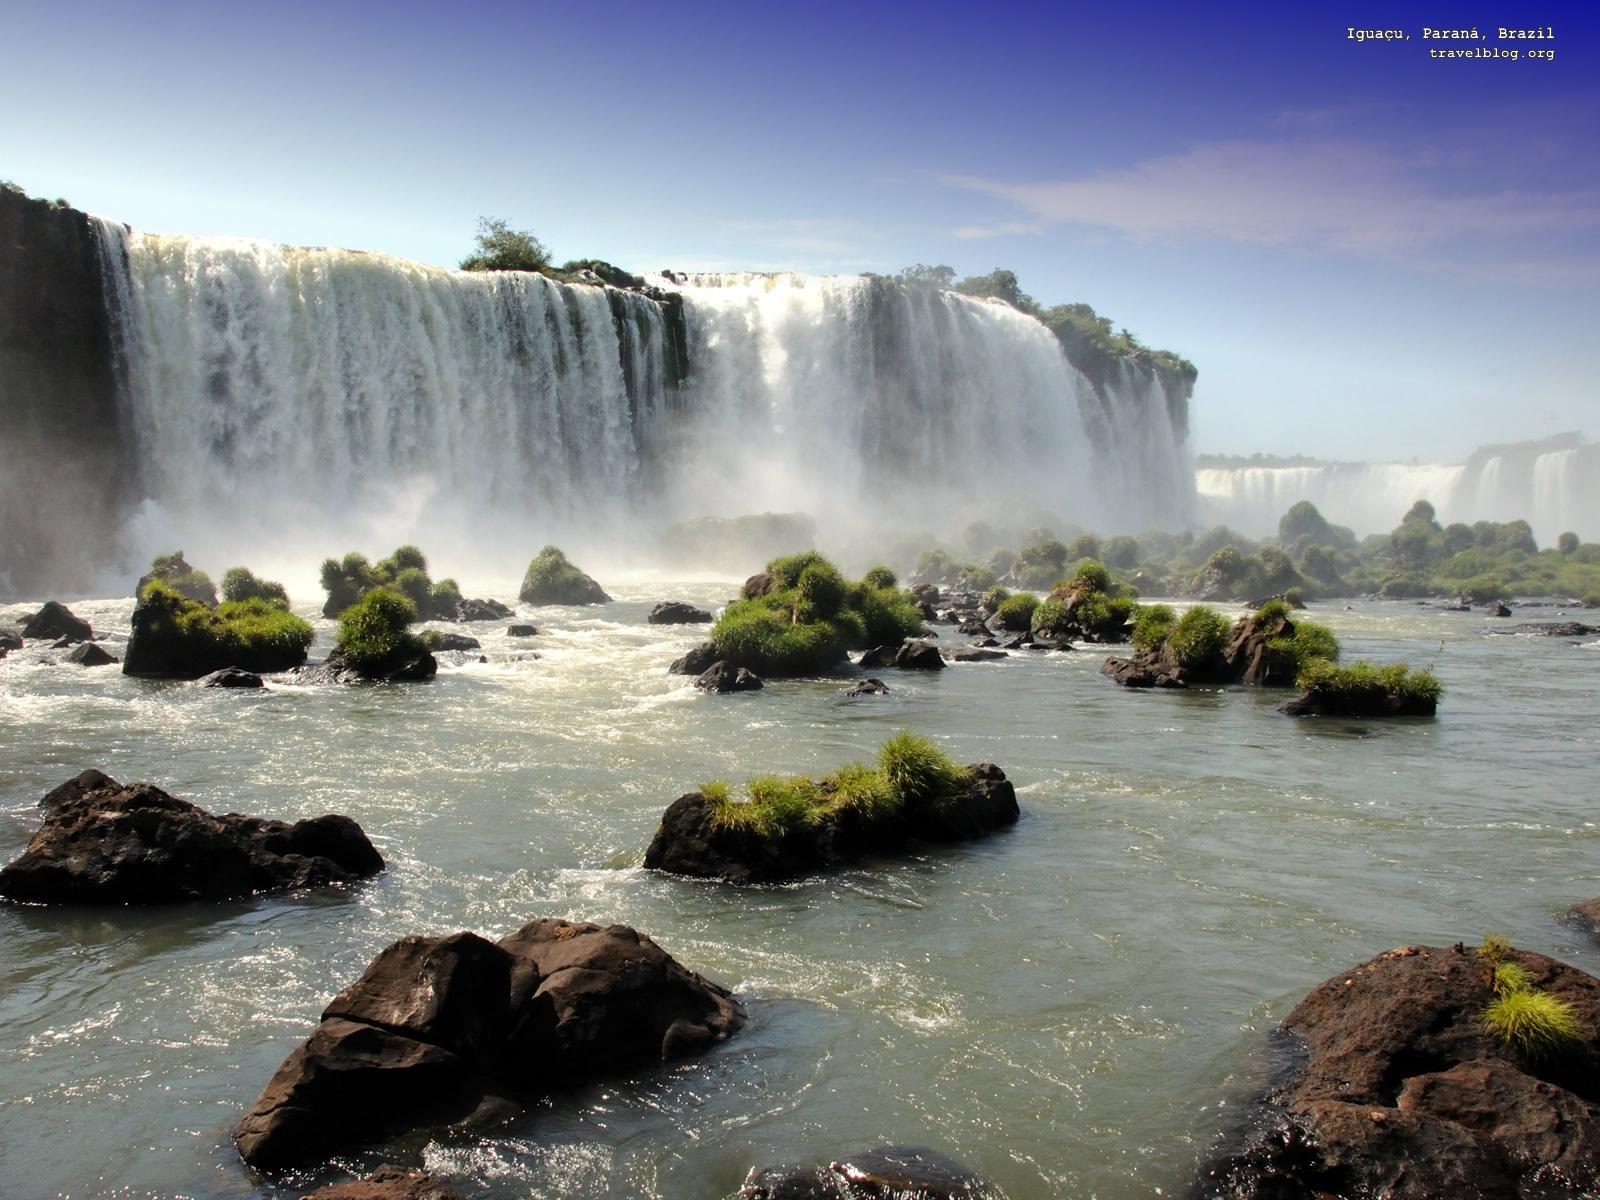 http://1.bp.blogspot.com/-eh55oLDkbNw/TccP9SlEWnI/AAAAAAAACJI/3Vbv-rLZ4E0/s1600/1302312806-waterfall_desktop_background-1600x1200.jpg